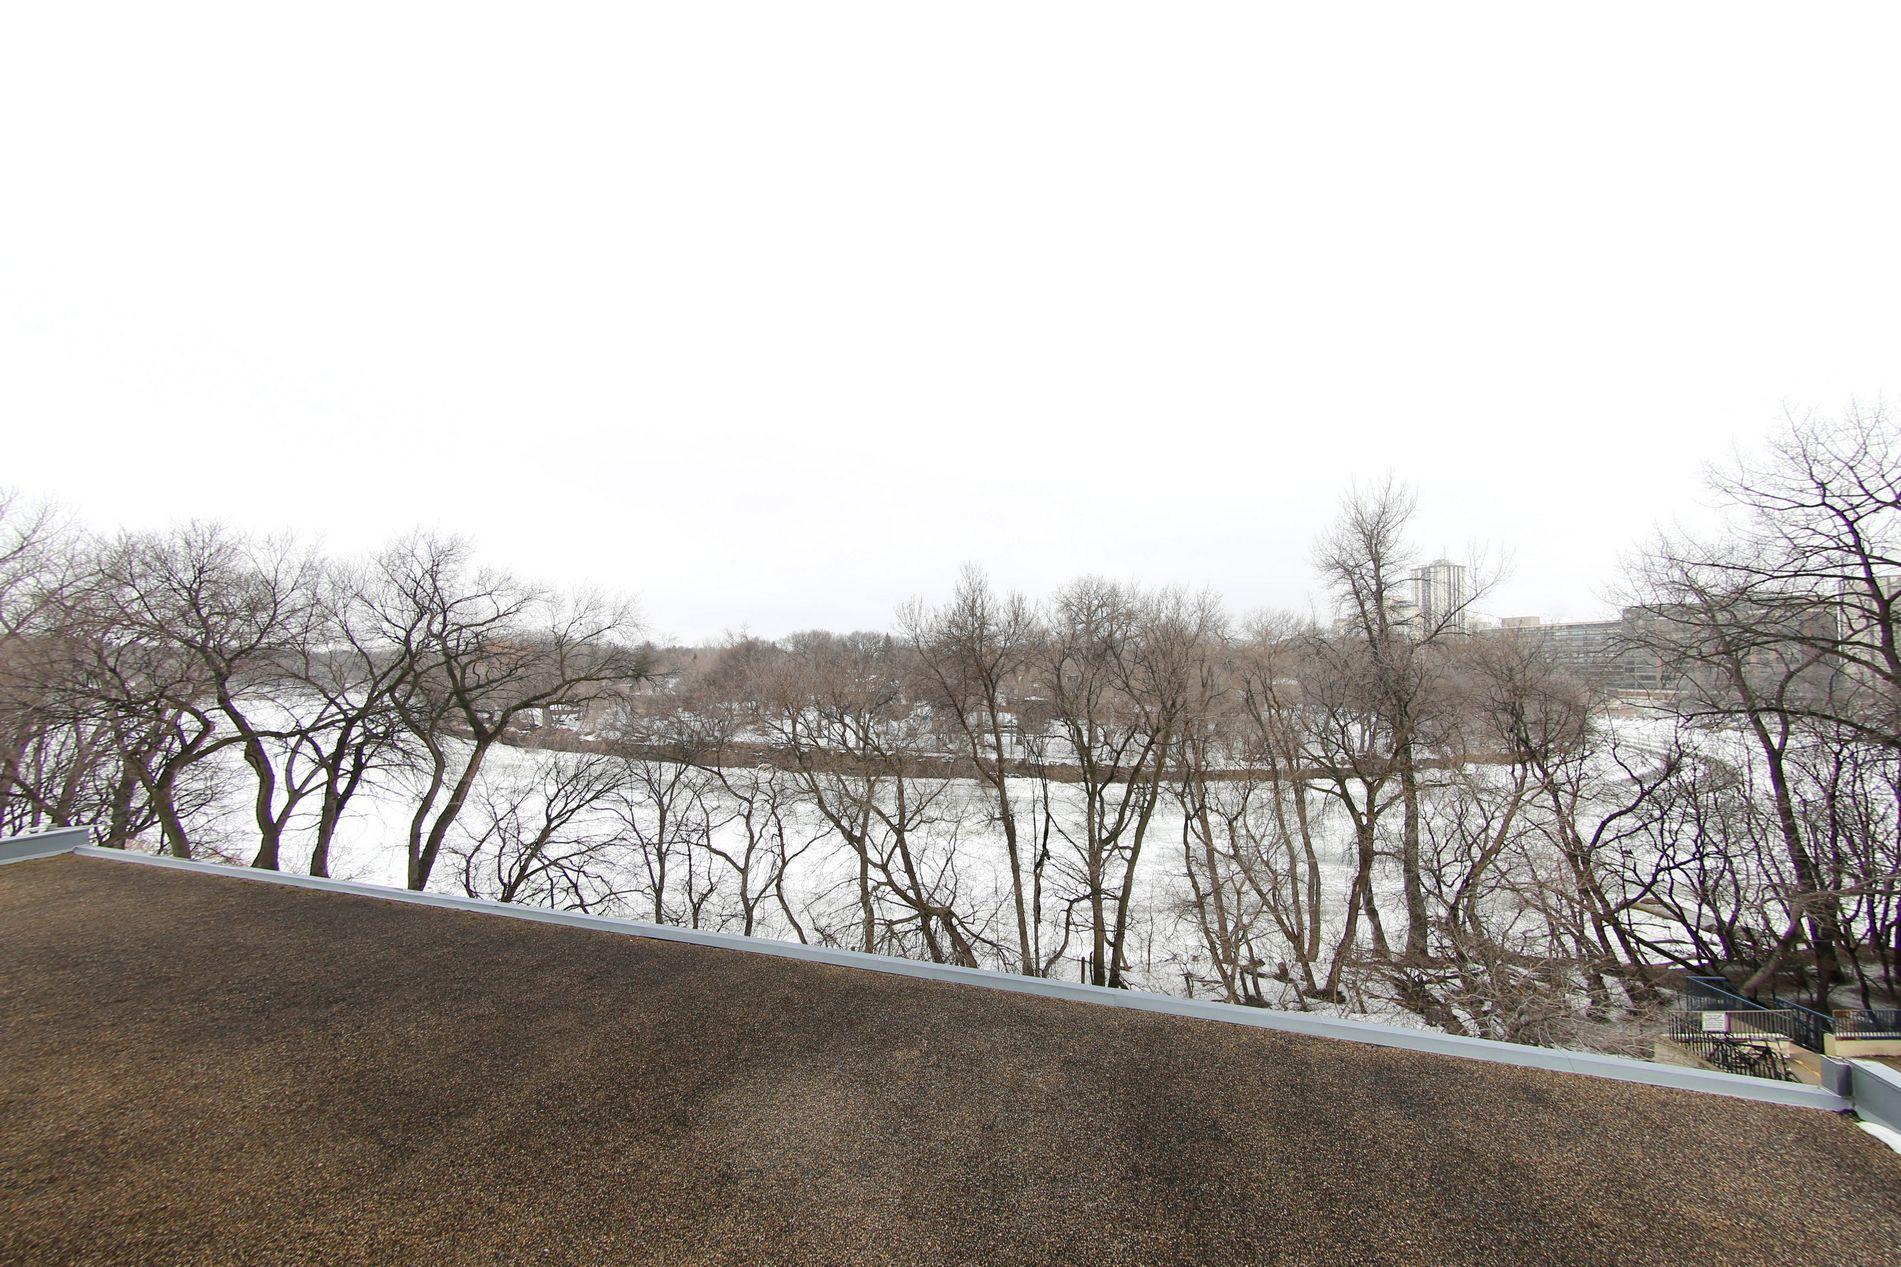 304-323 Wellington Crescent, Winnipeg, Manitoba  R3M 0A4 - Photo 24 - 1703997